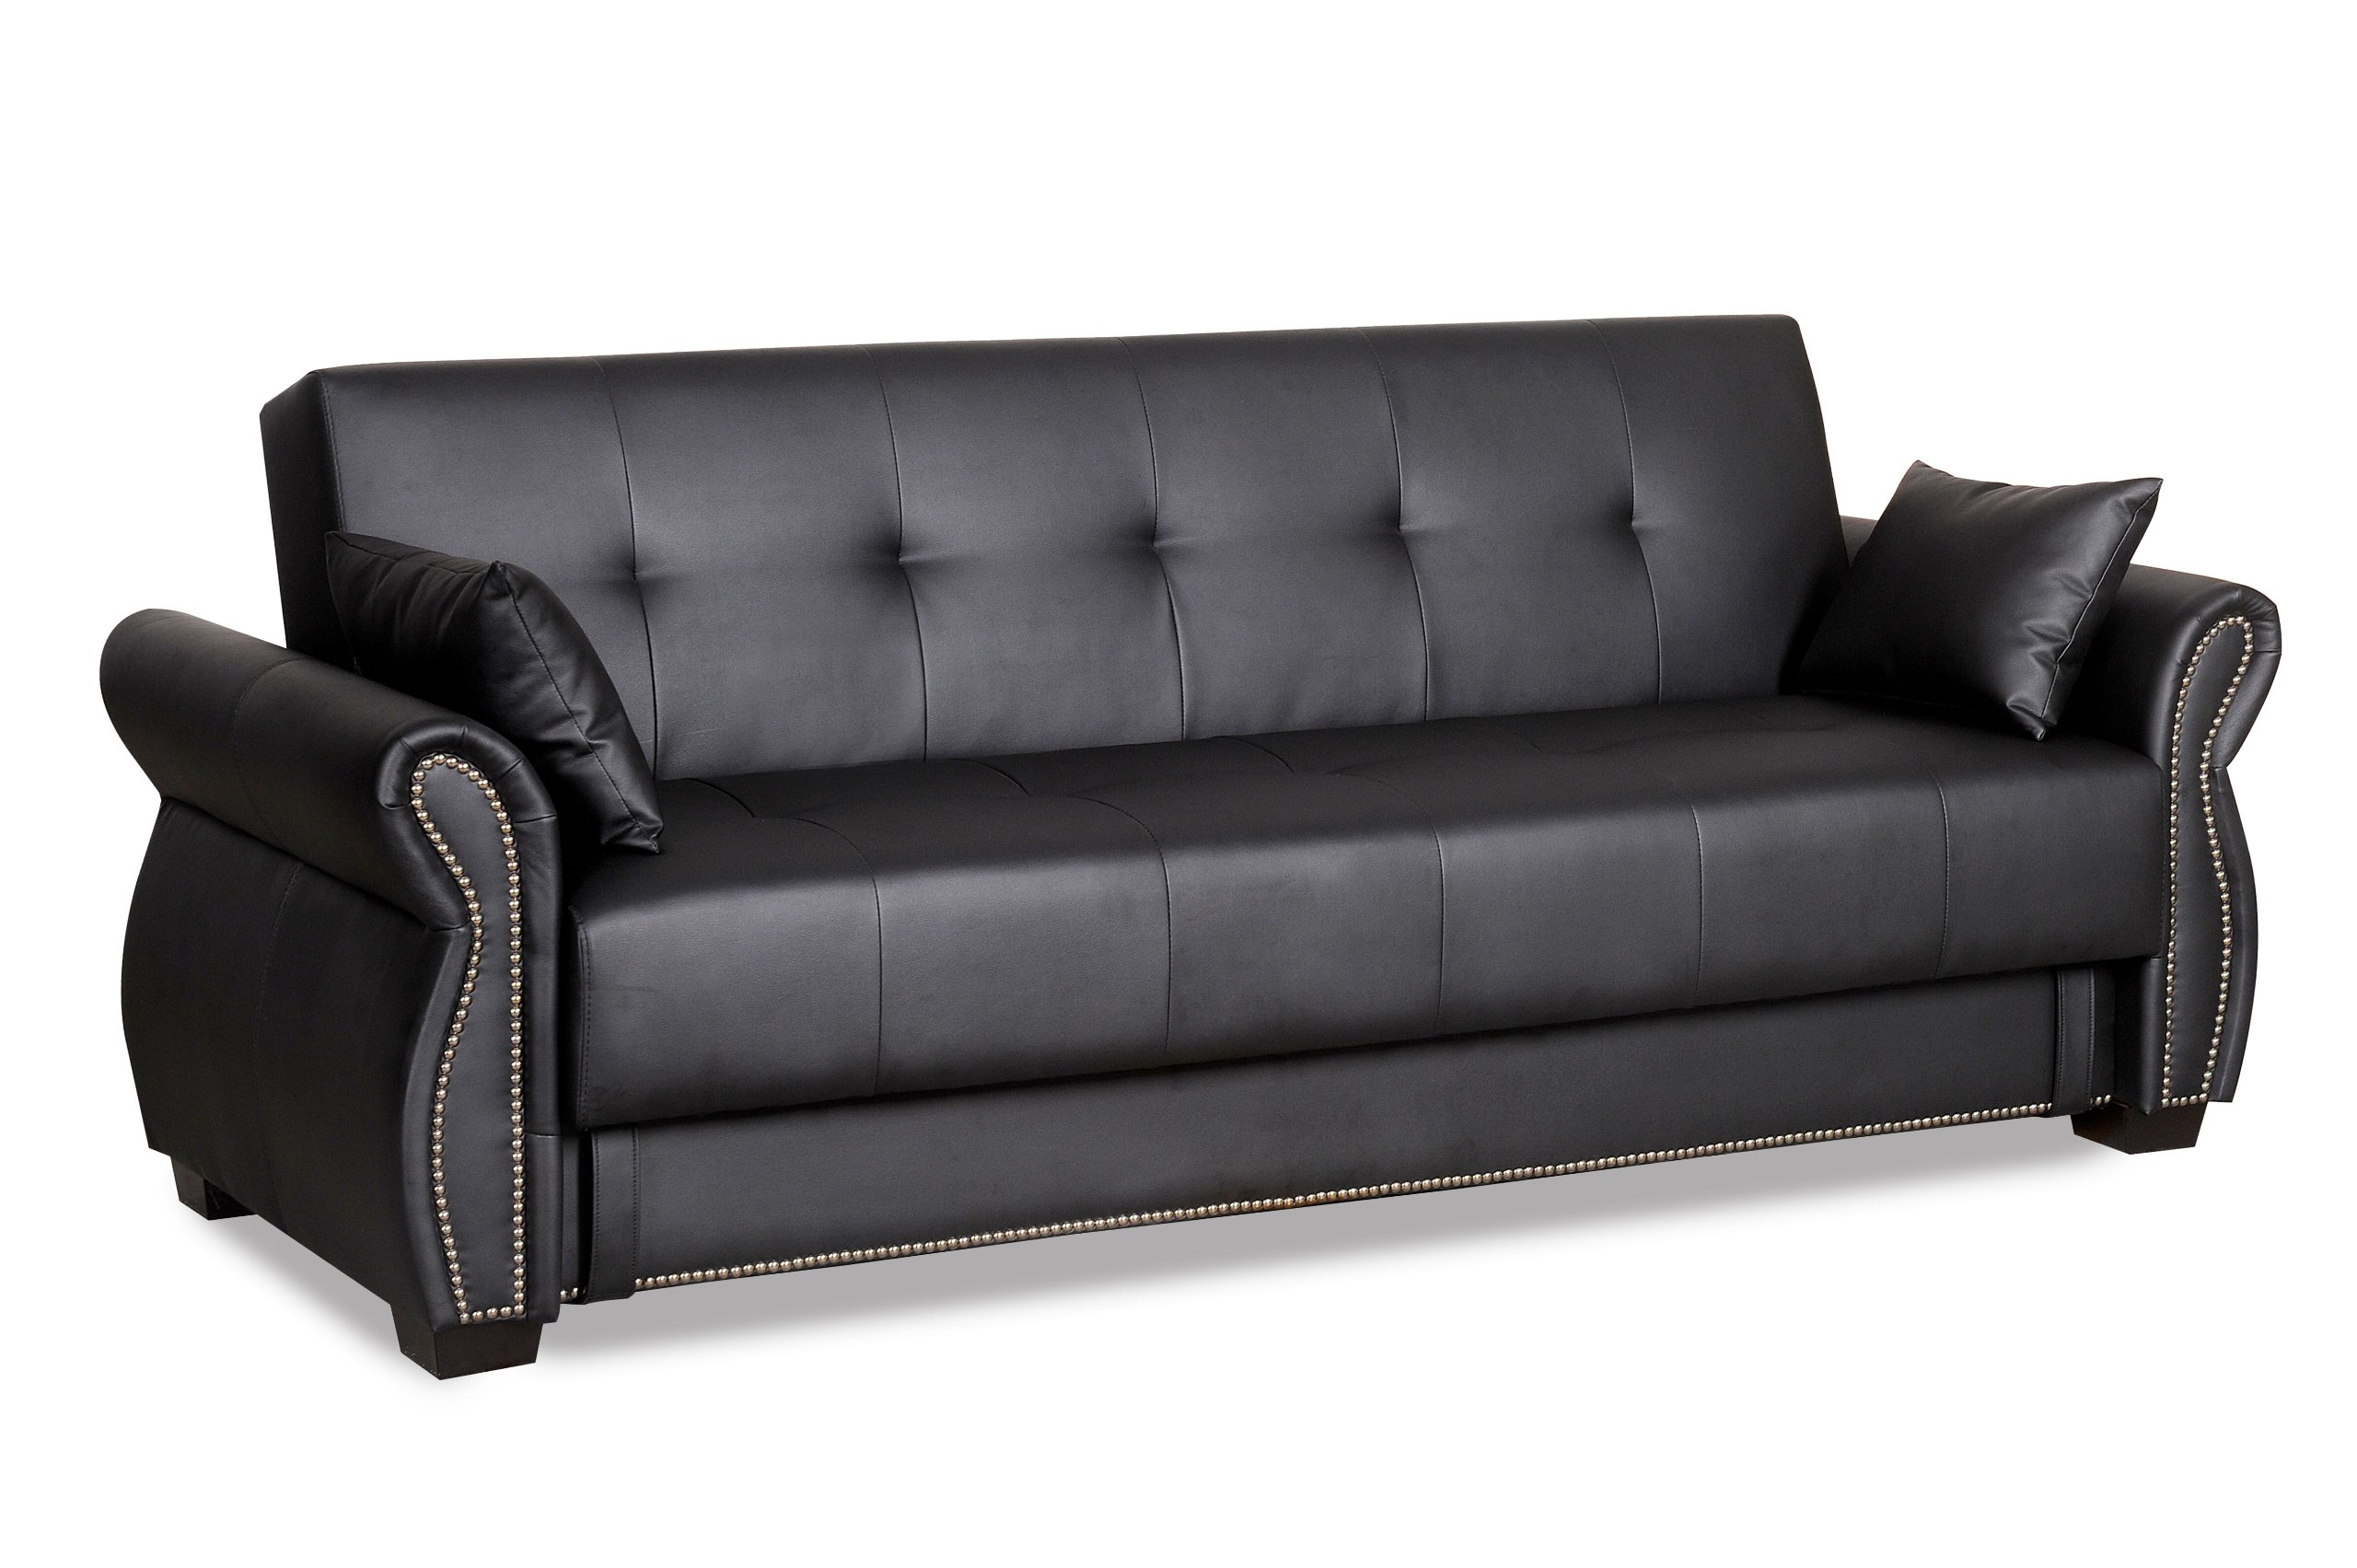 Serta Dream Convertibles Seville Sofa Ebony